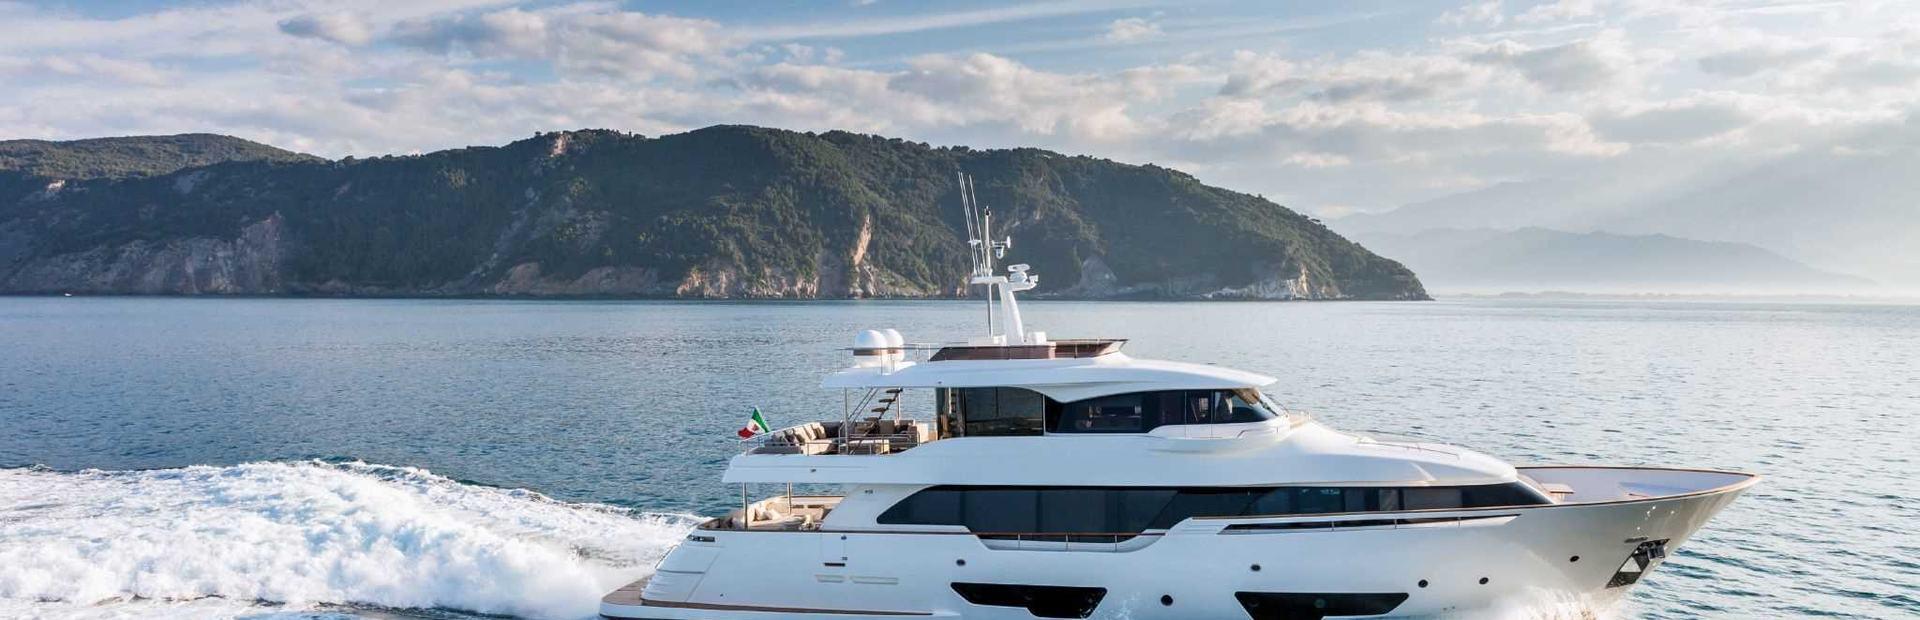 Navetta 28 Yacht Charter